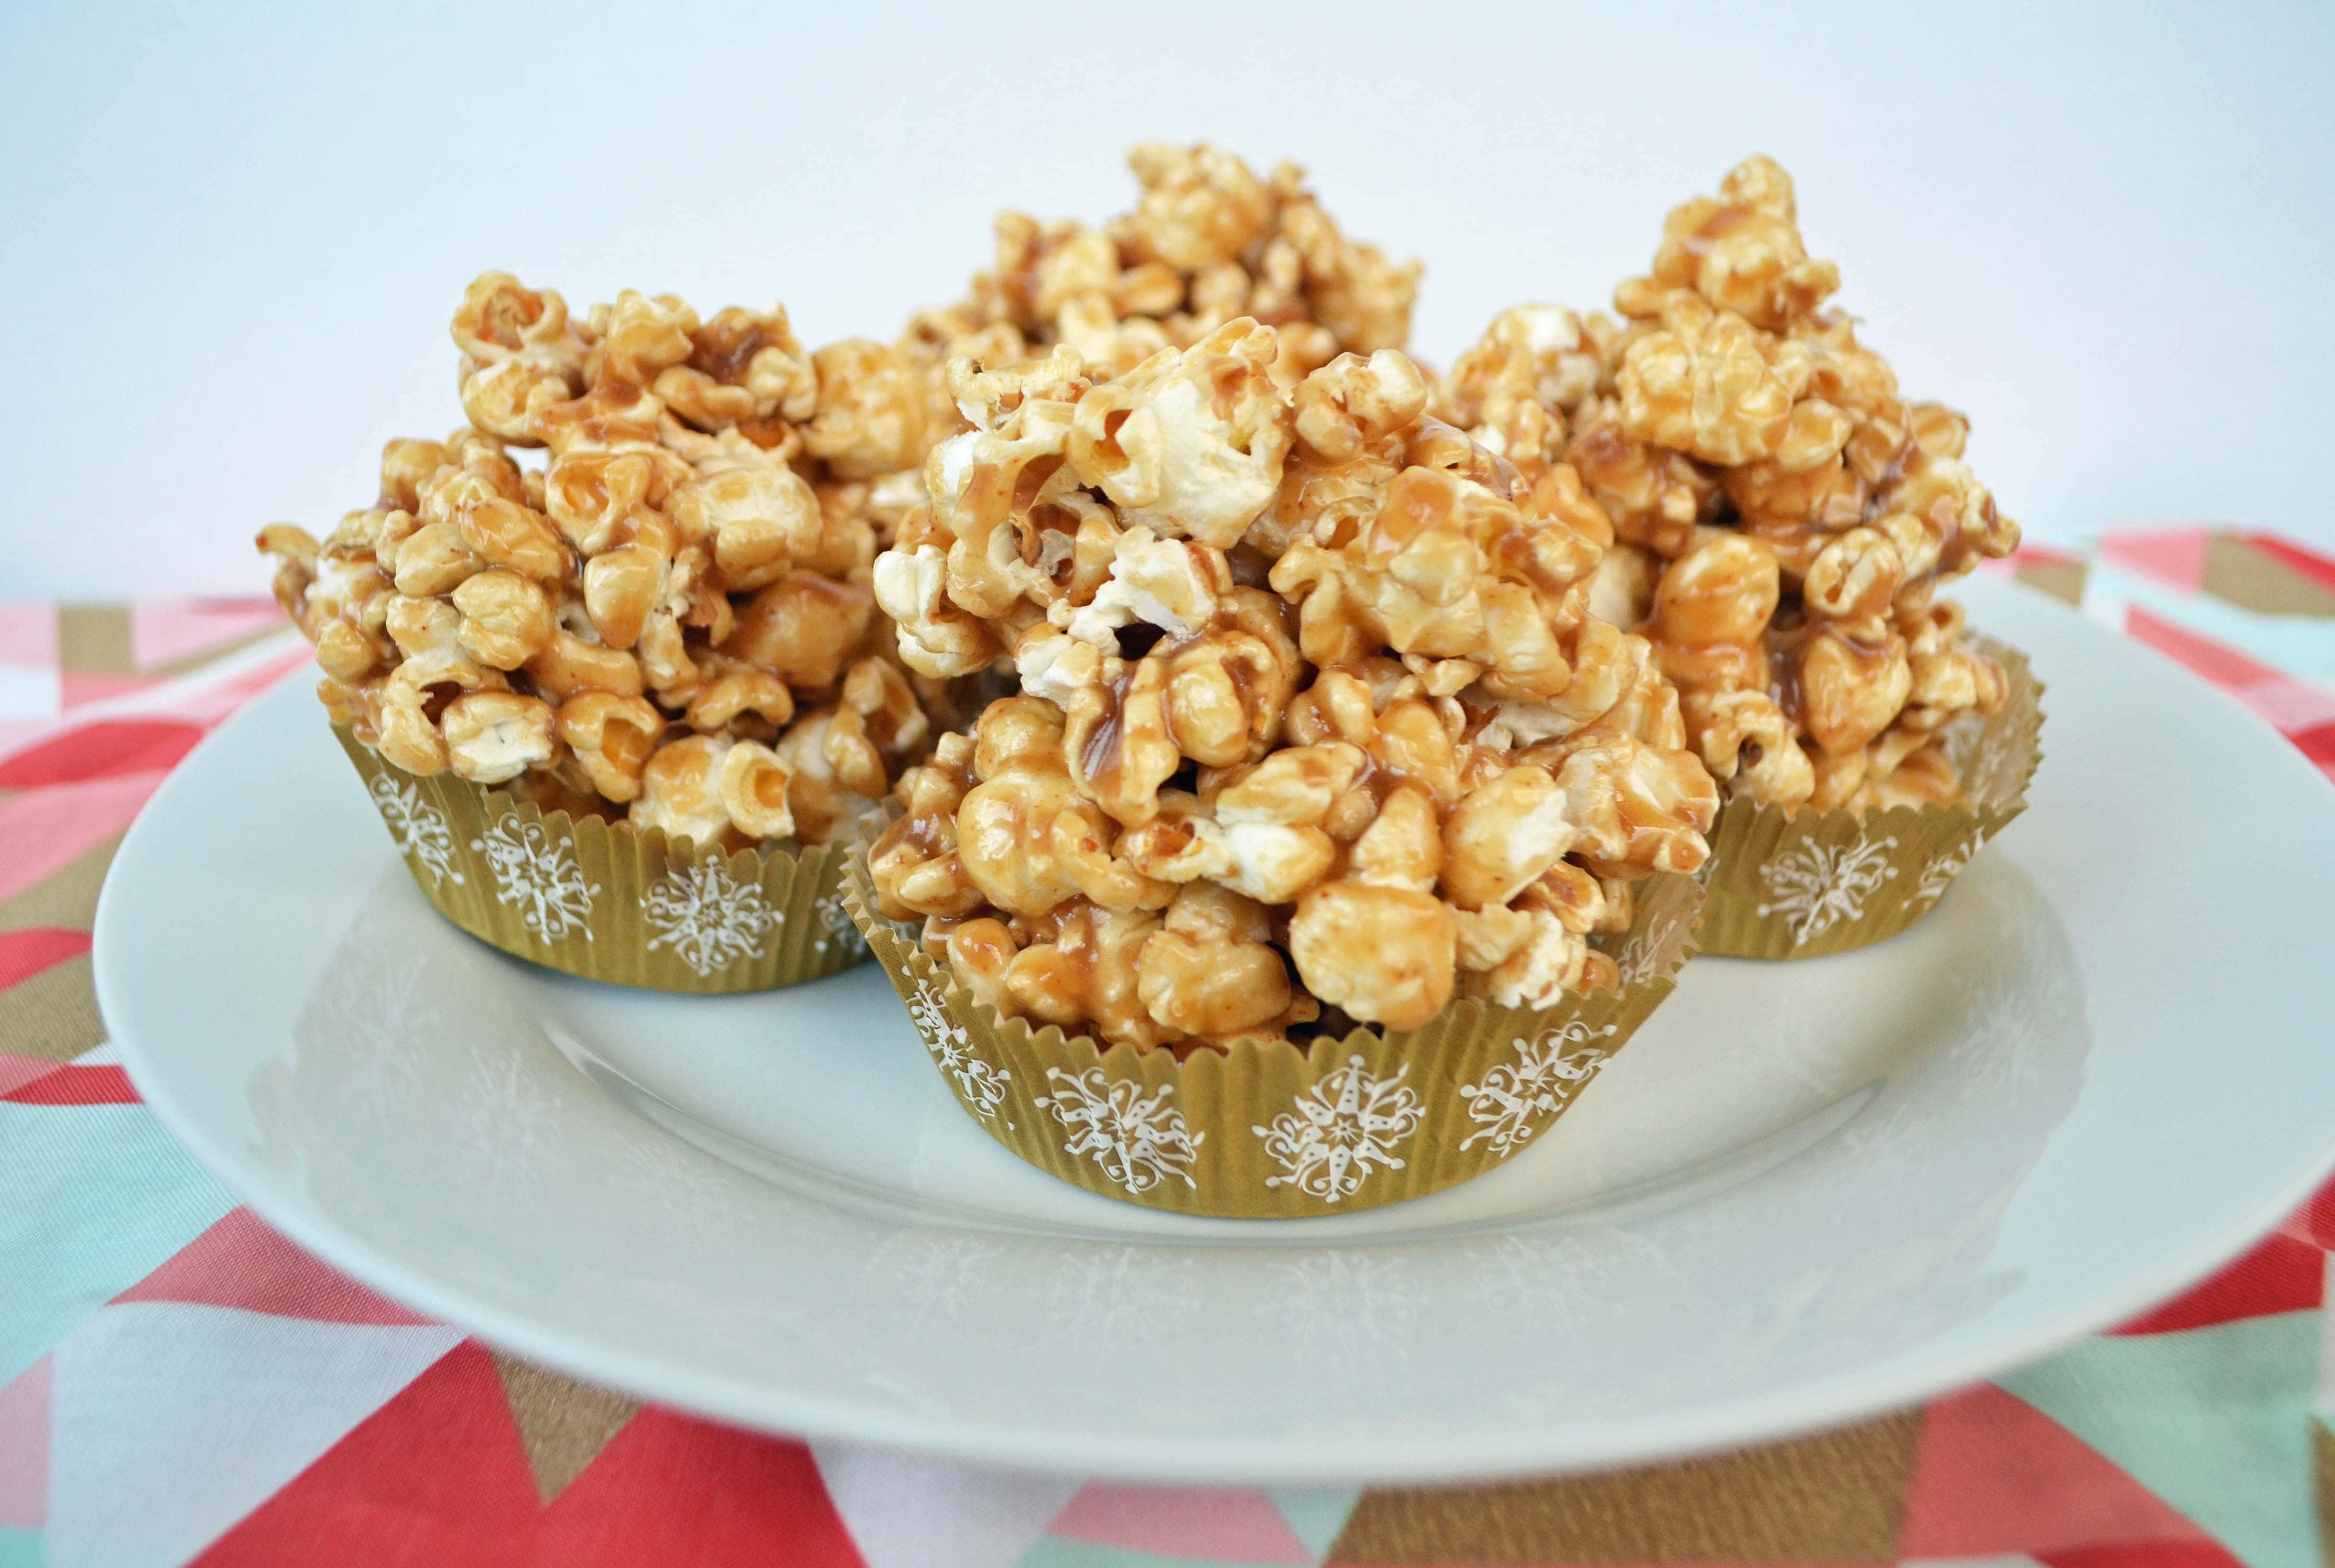 Cassidy's Classic Caramel Corn